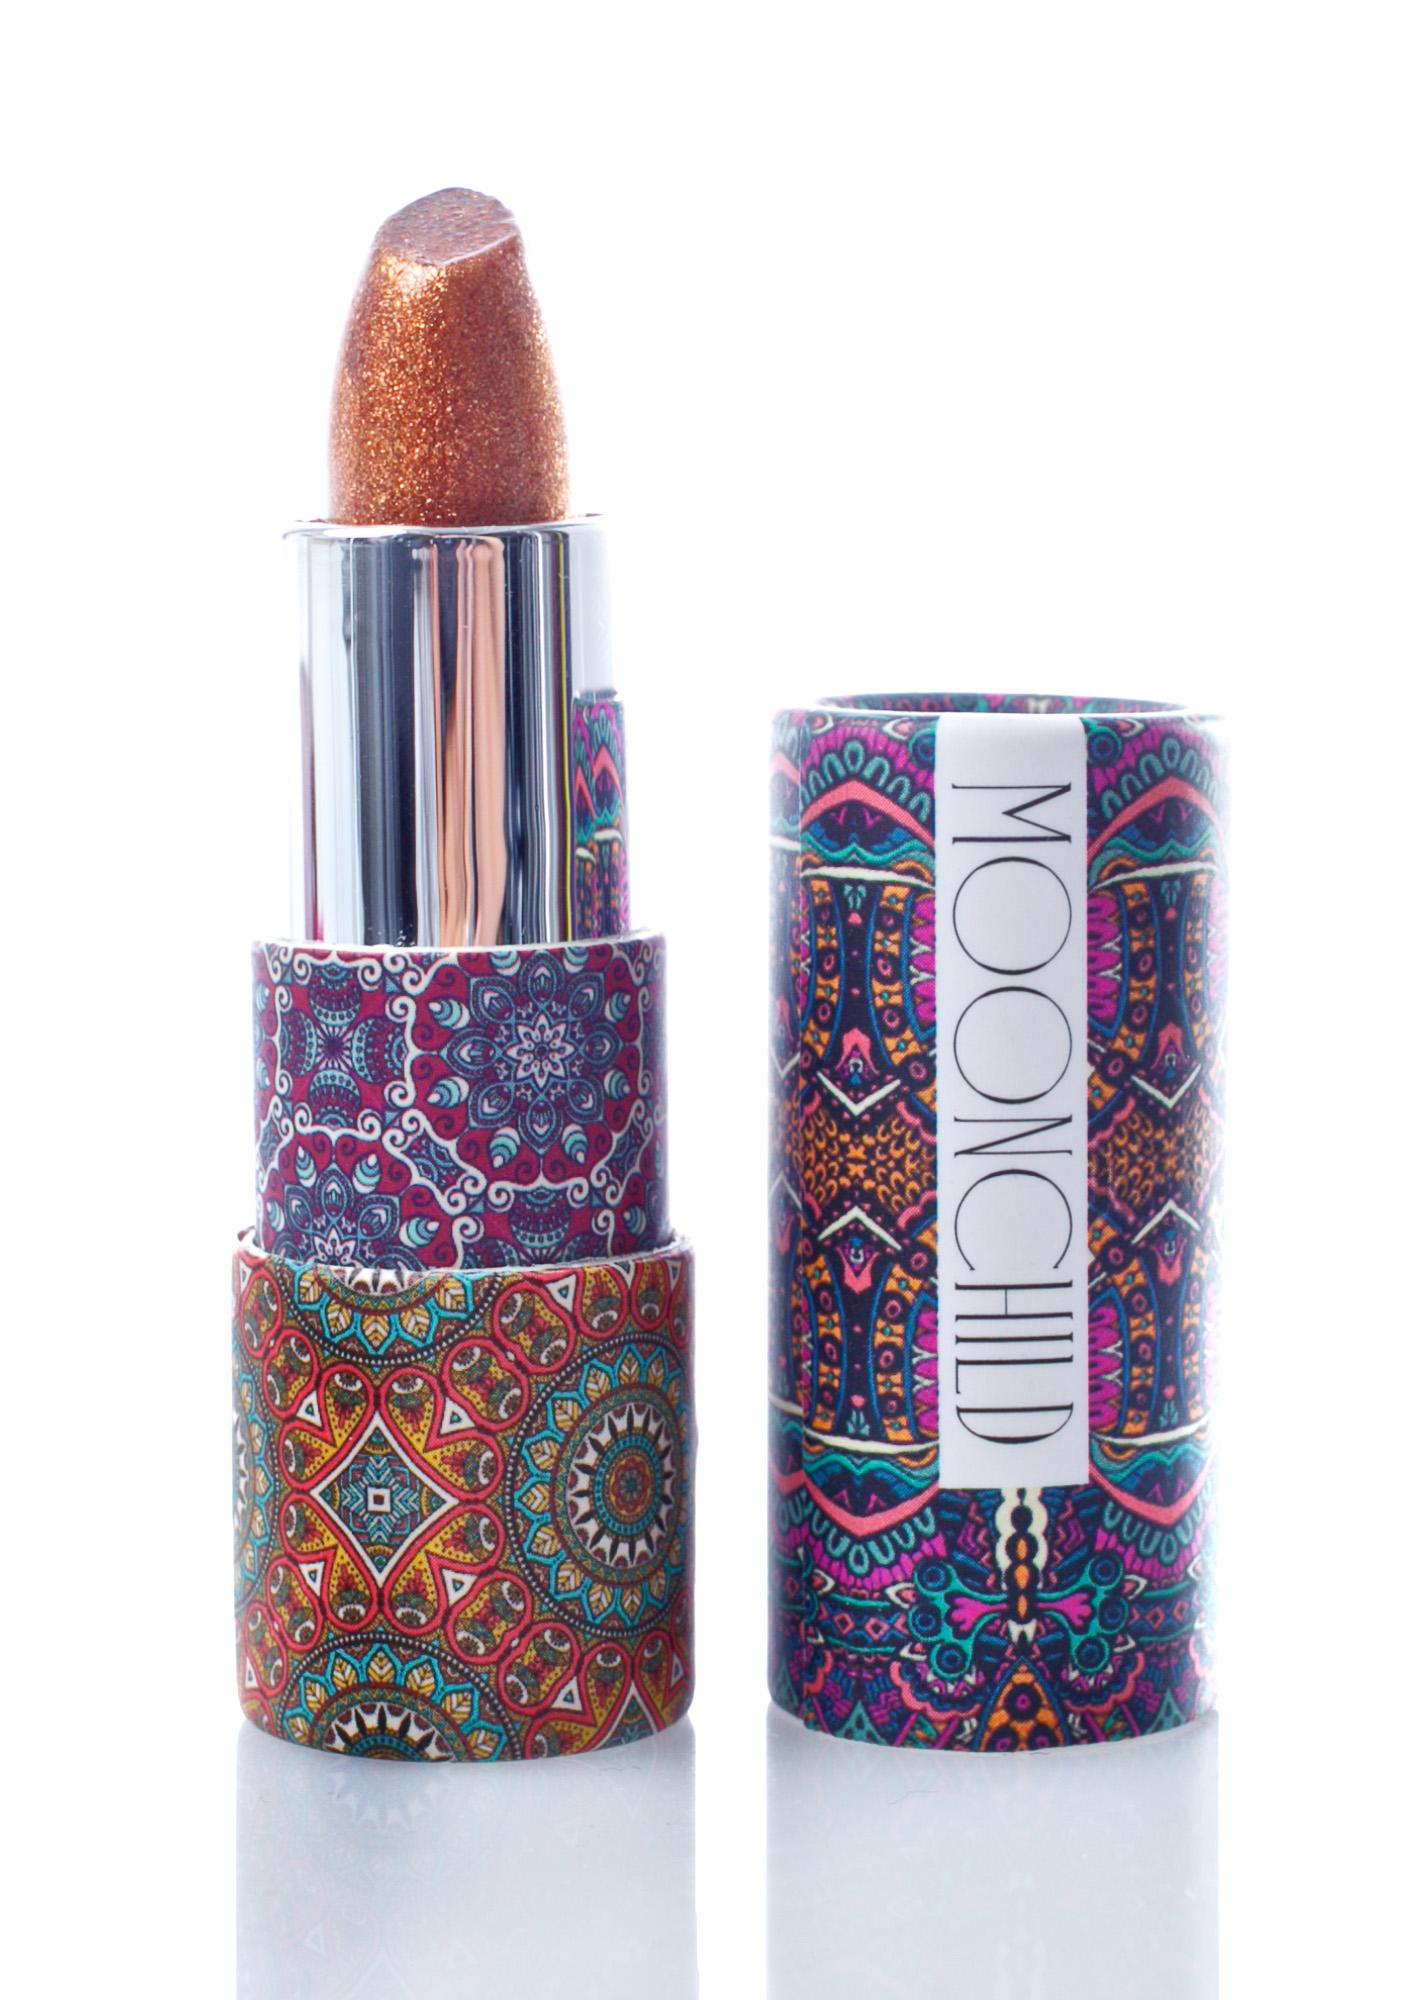 Moonchild Lipstick Golden Lipstick